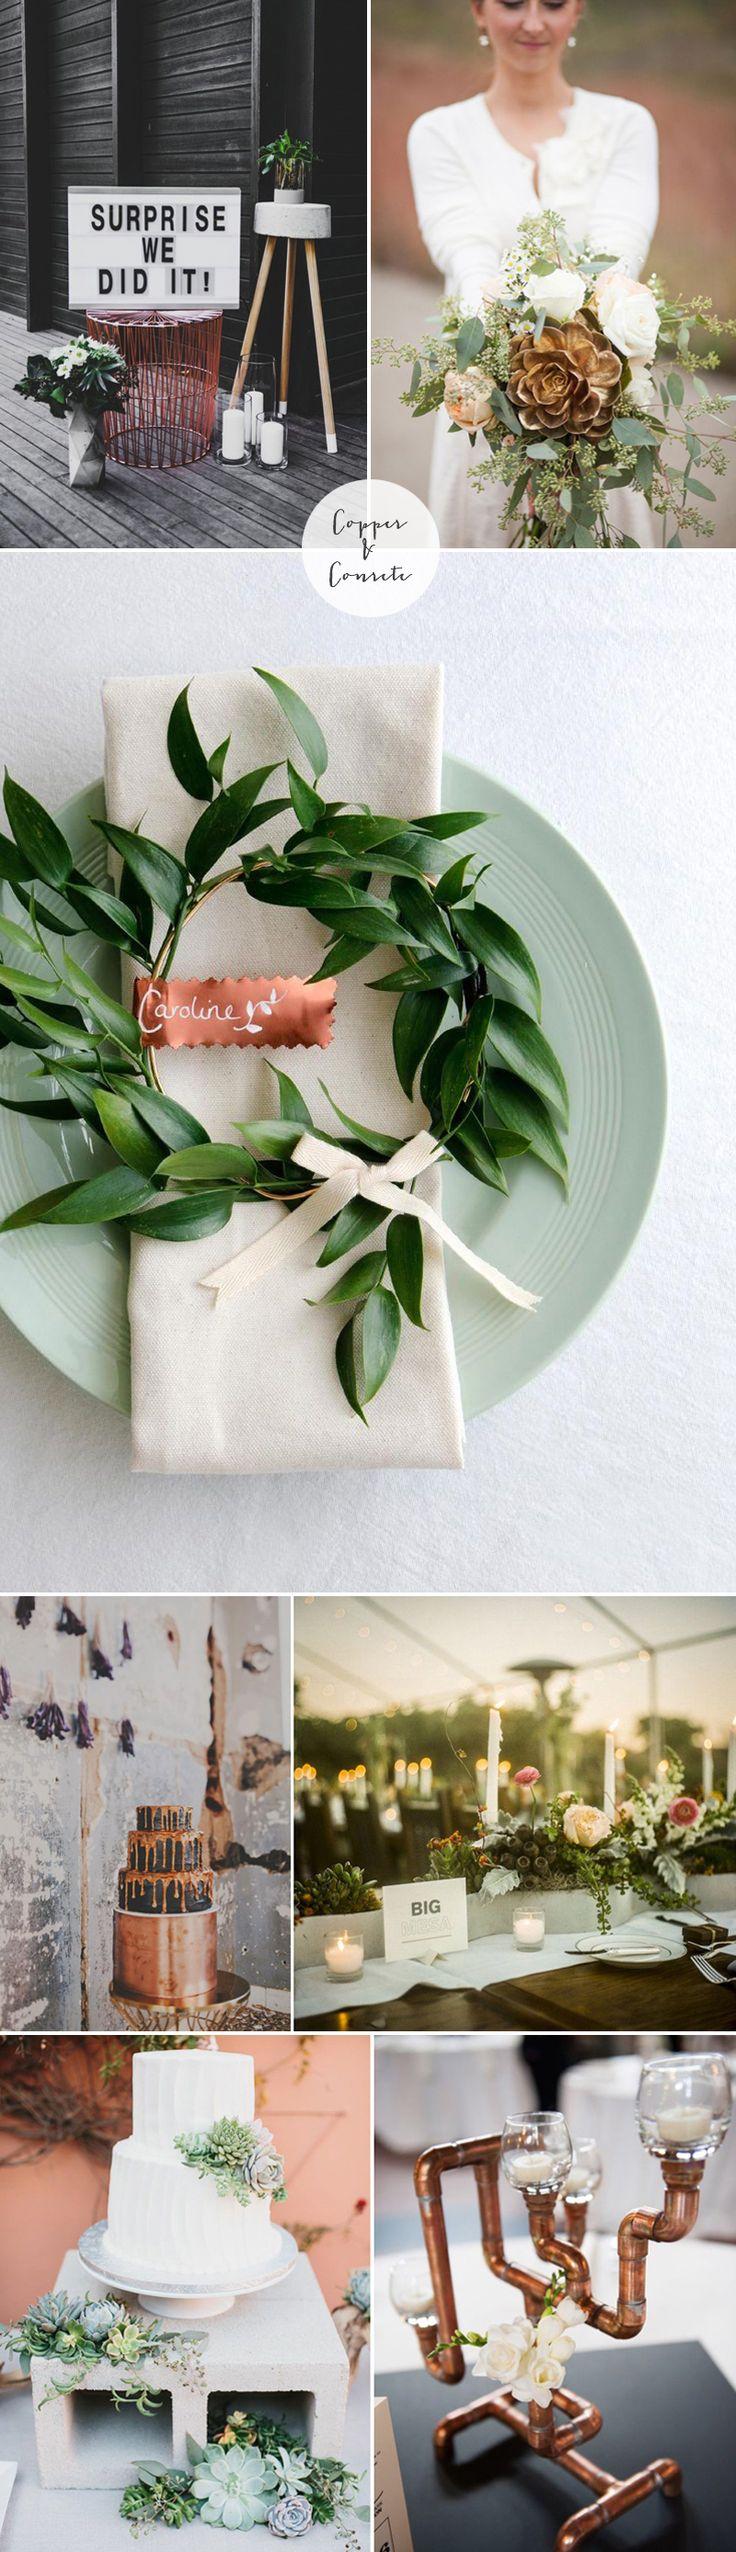 best june styled shoot images on pinterest copper wedding